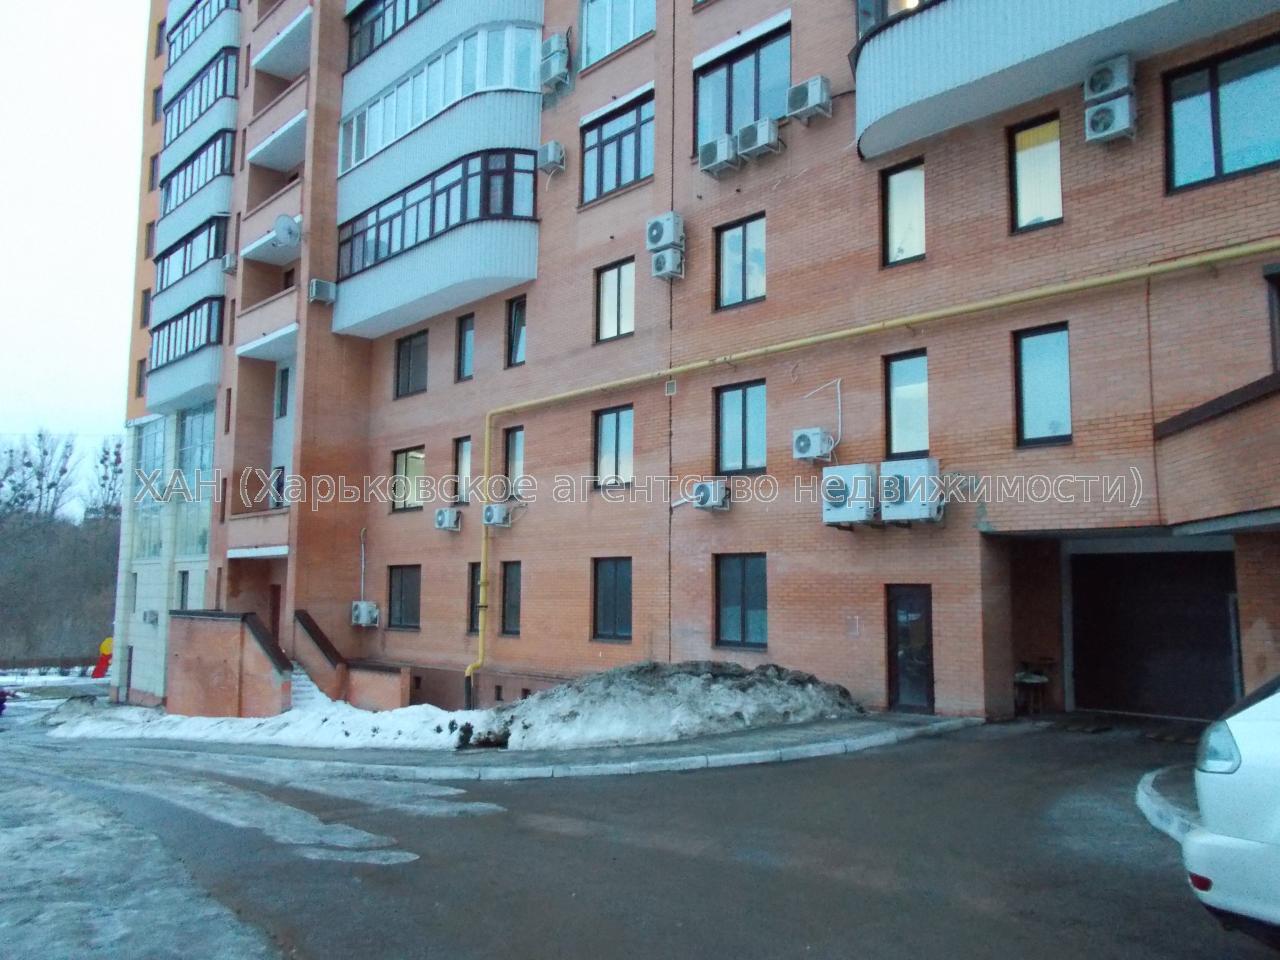 Фото 2 - Продам офис в многоквартирном доме Харьков, Отакара Яроша ул.